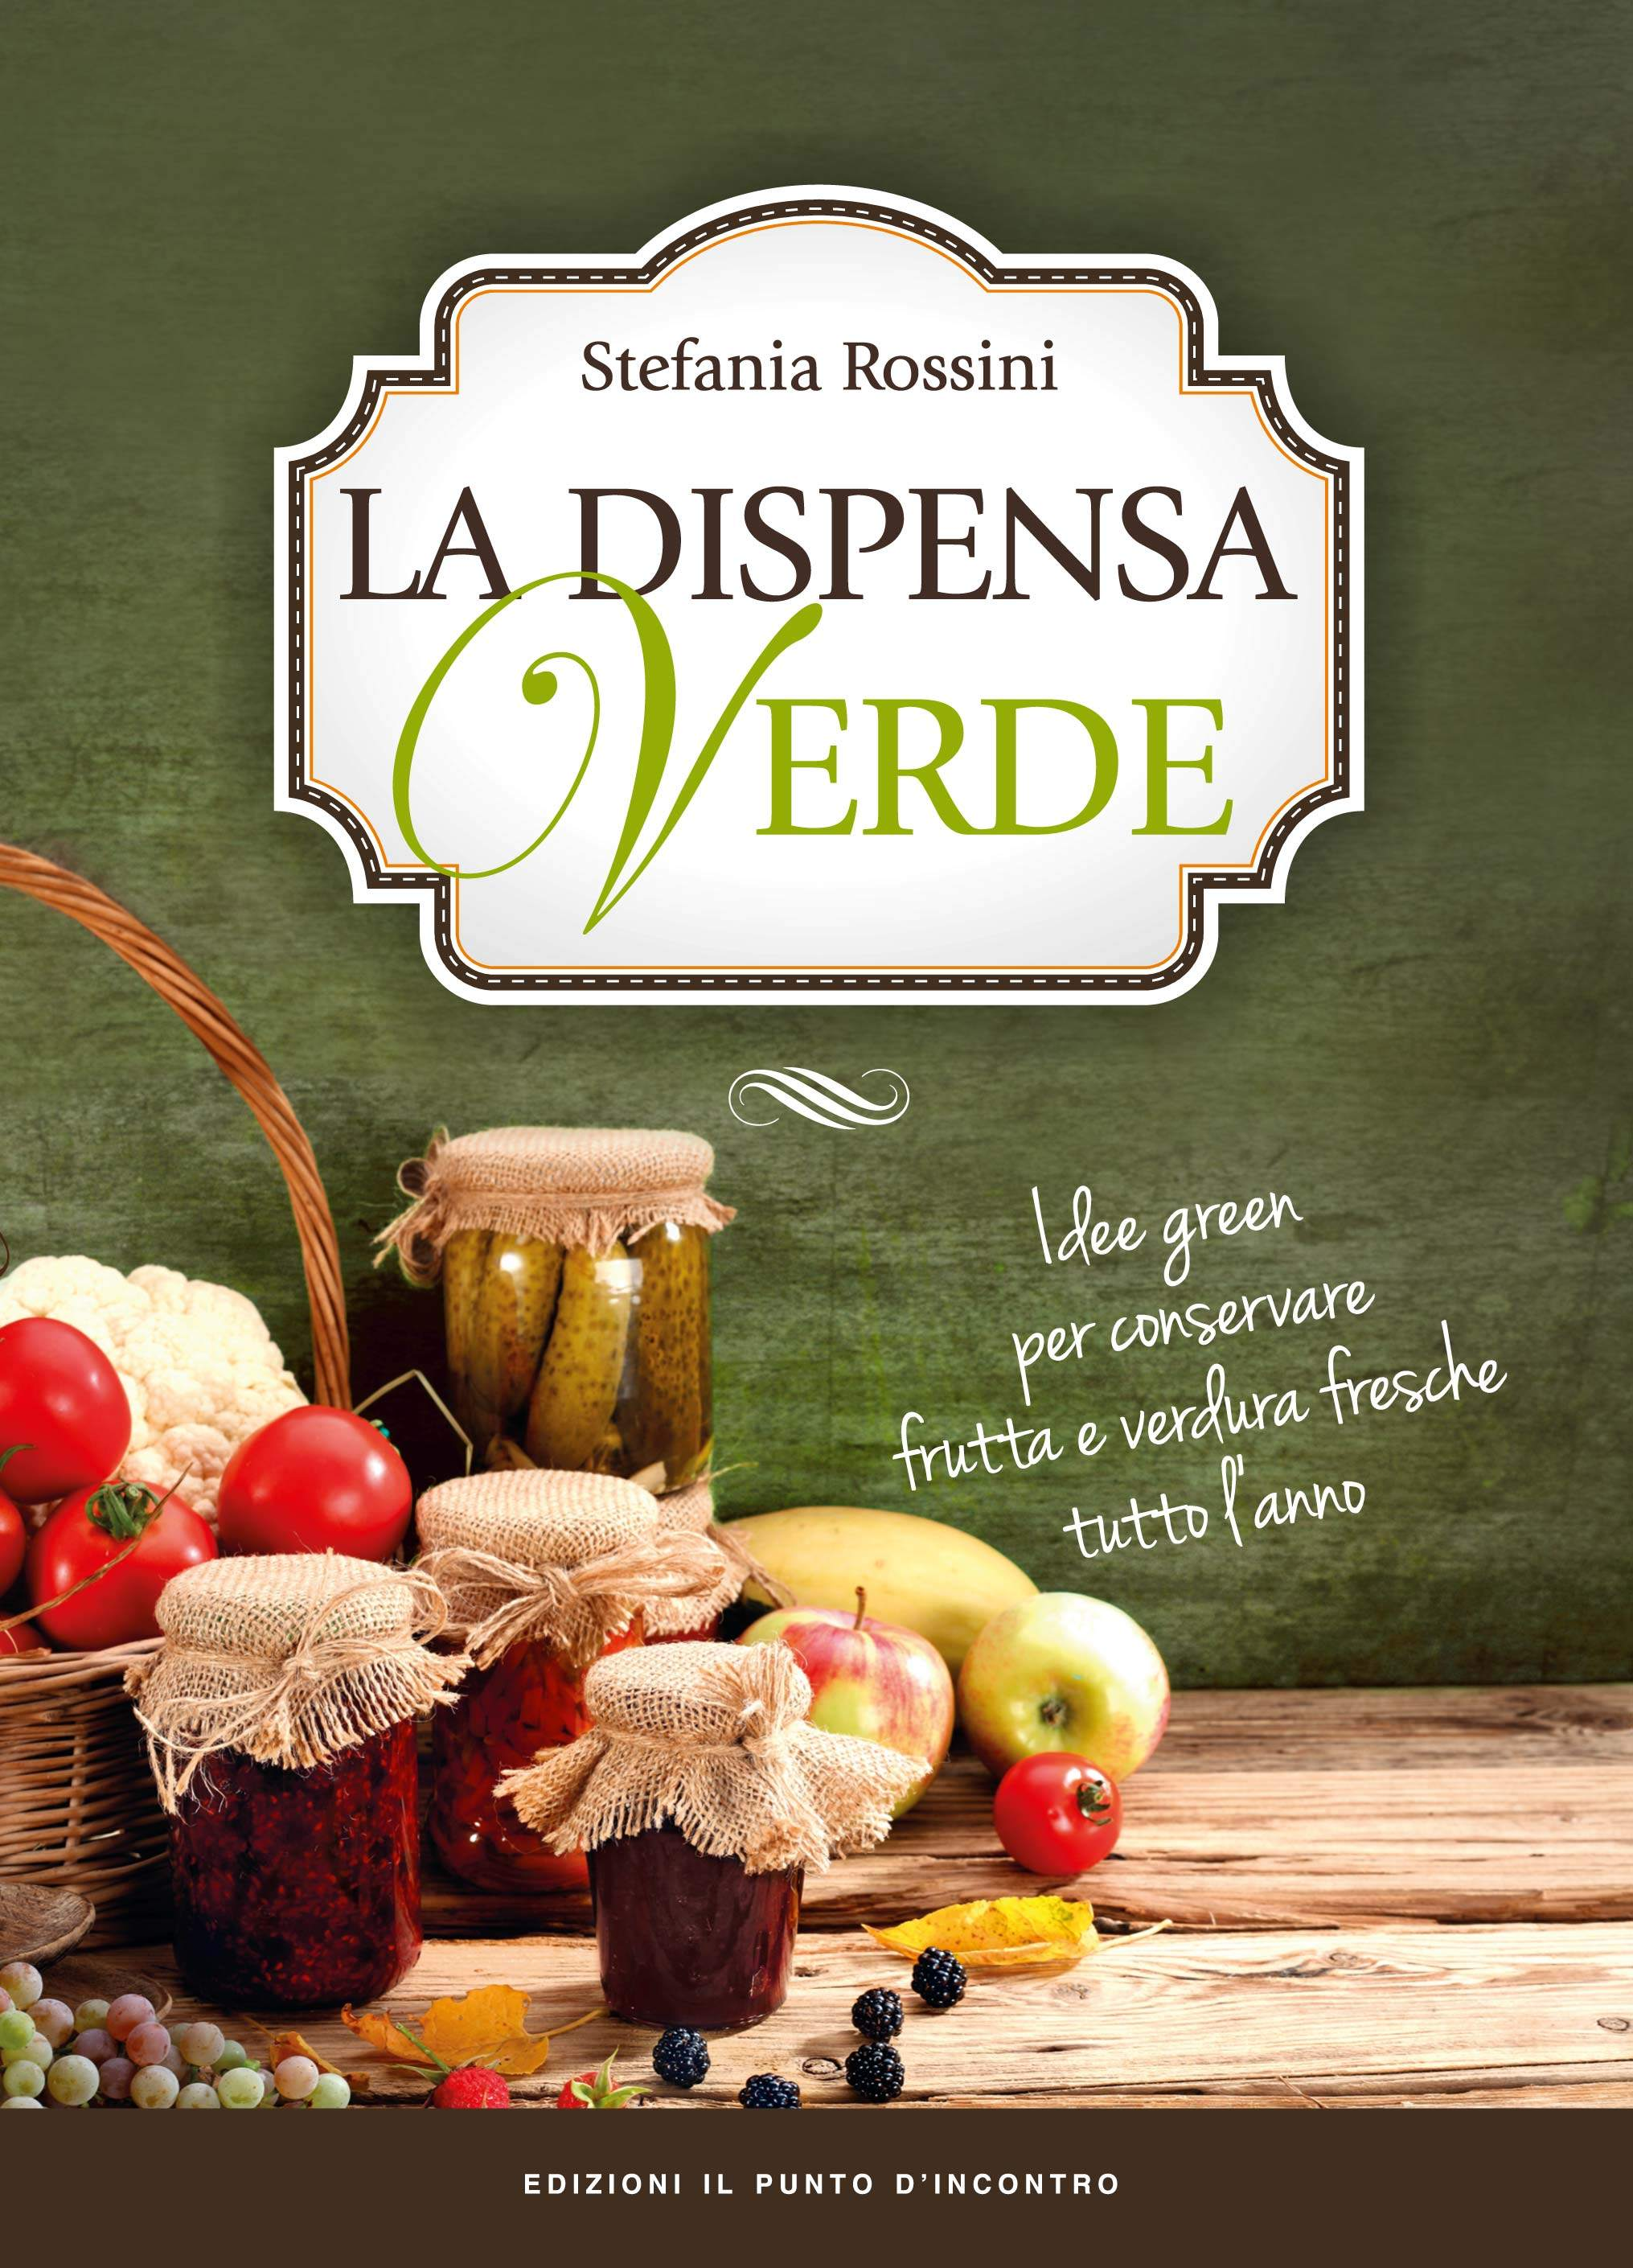 Stefania Rossini, La dispensa verde